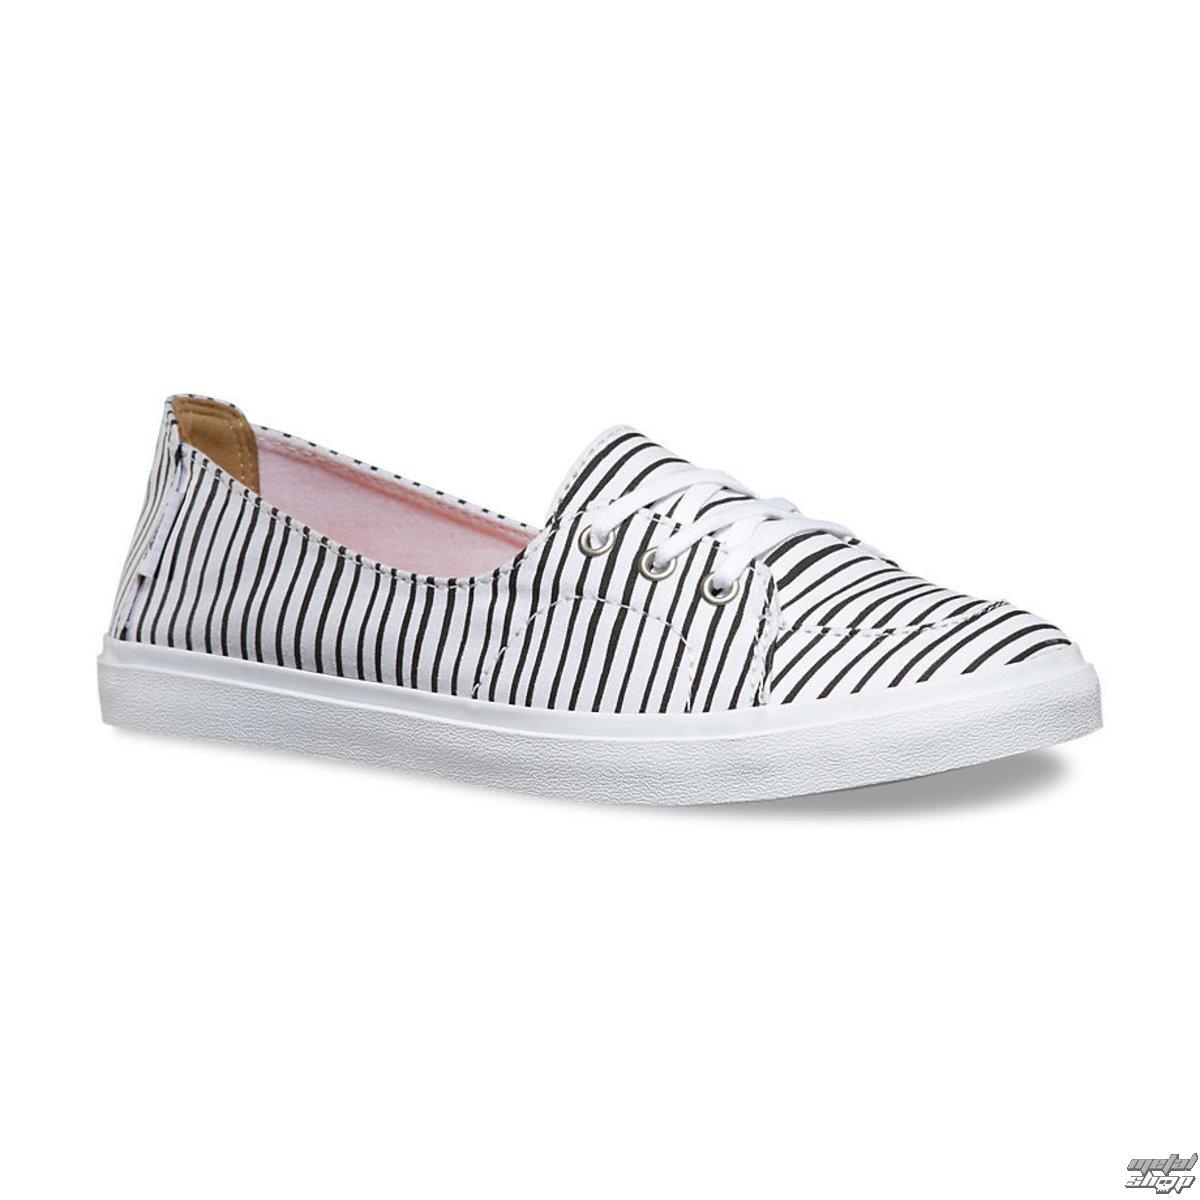 topánky dámske VANS - Palisades (Just Stripes) - True White / BLK - V4LDIF8